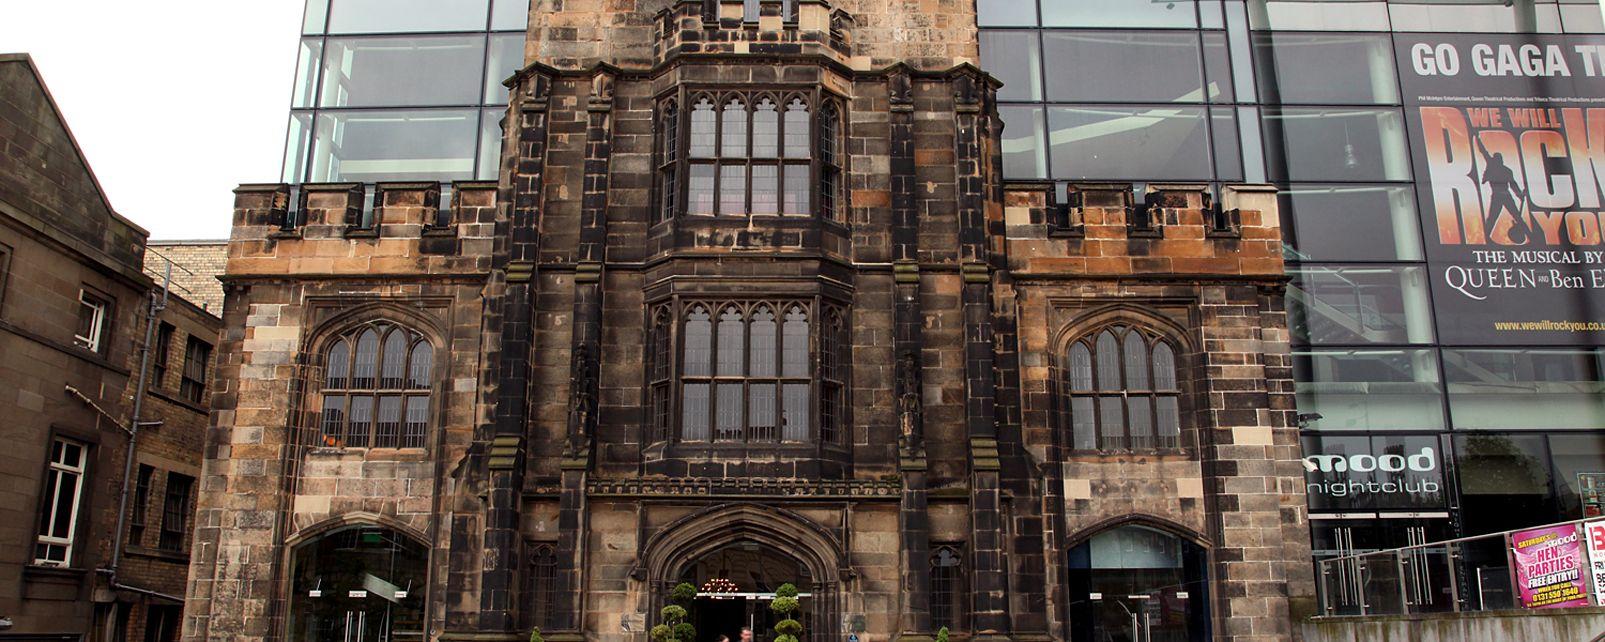 Hotel Glasshouse in Edinburgh